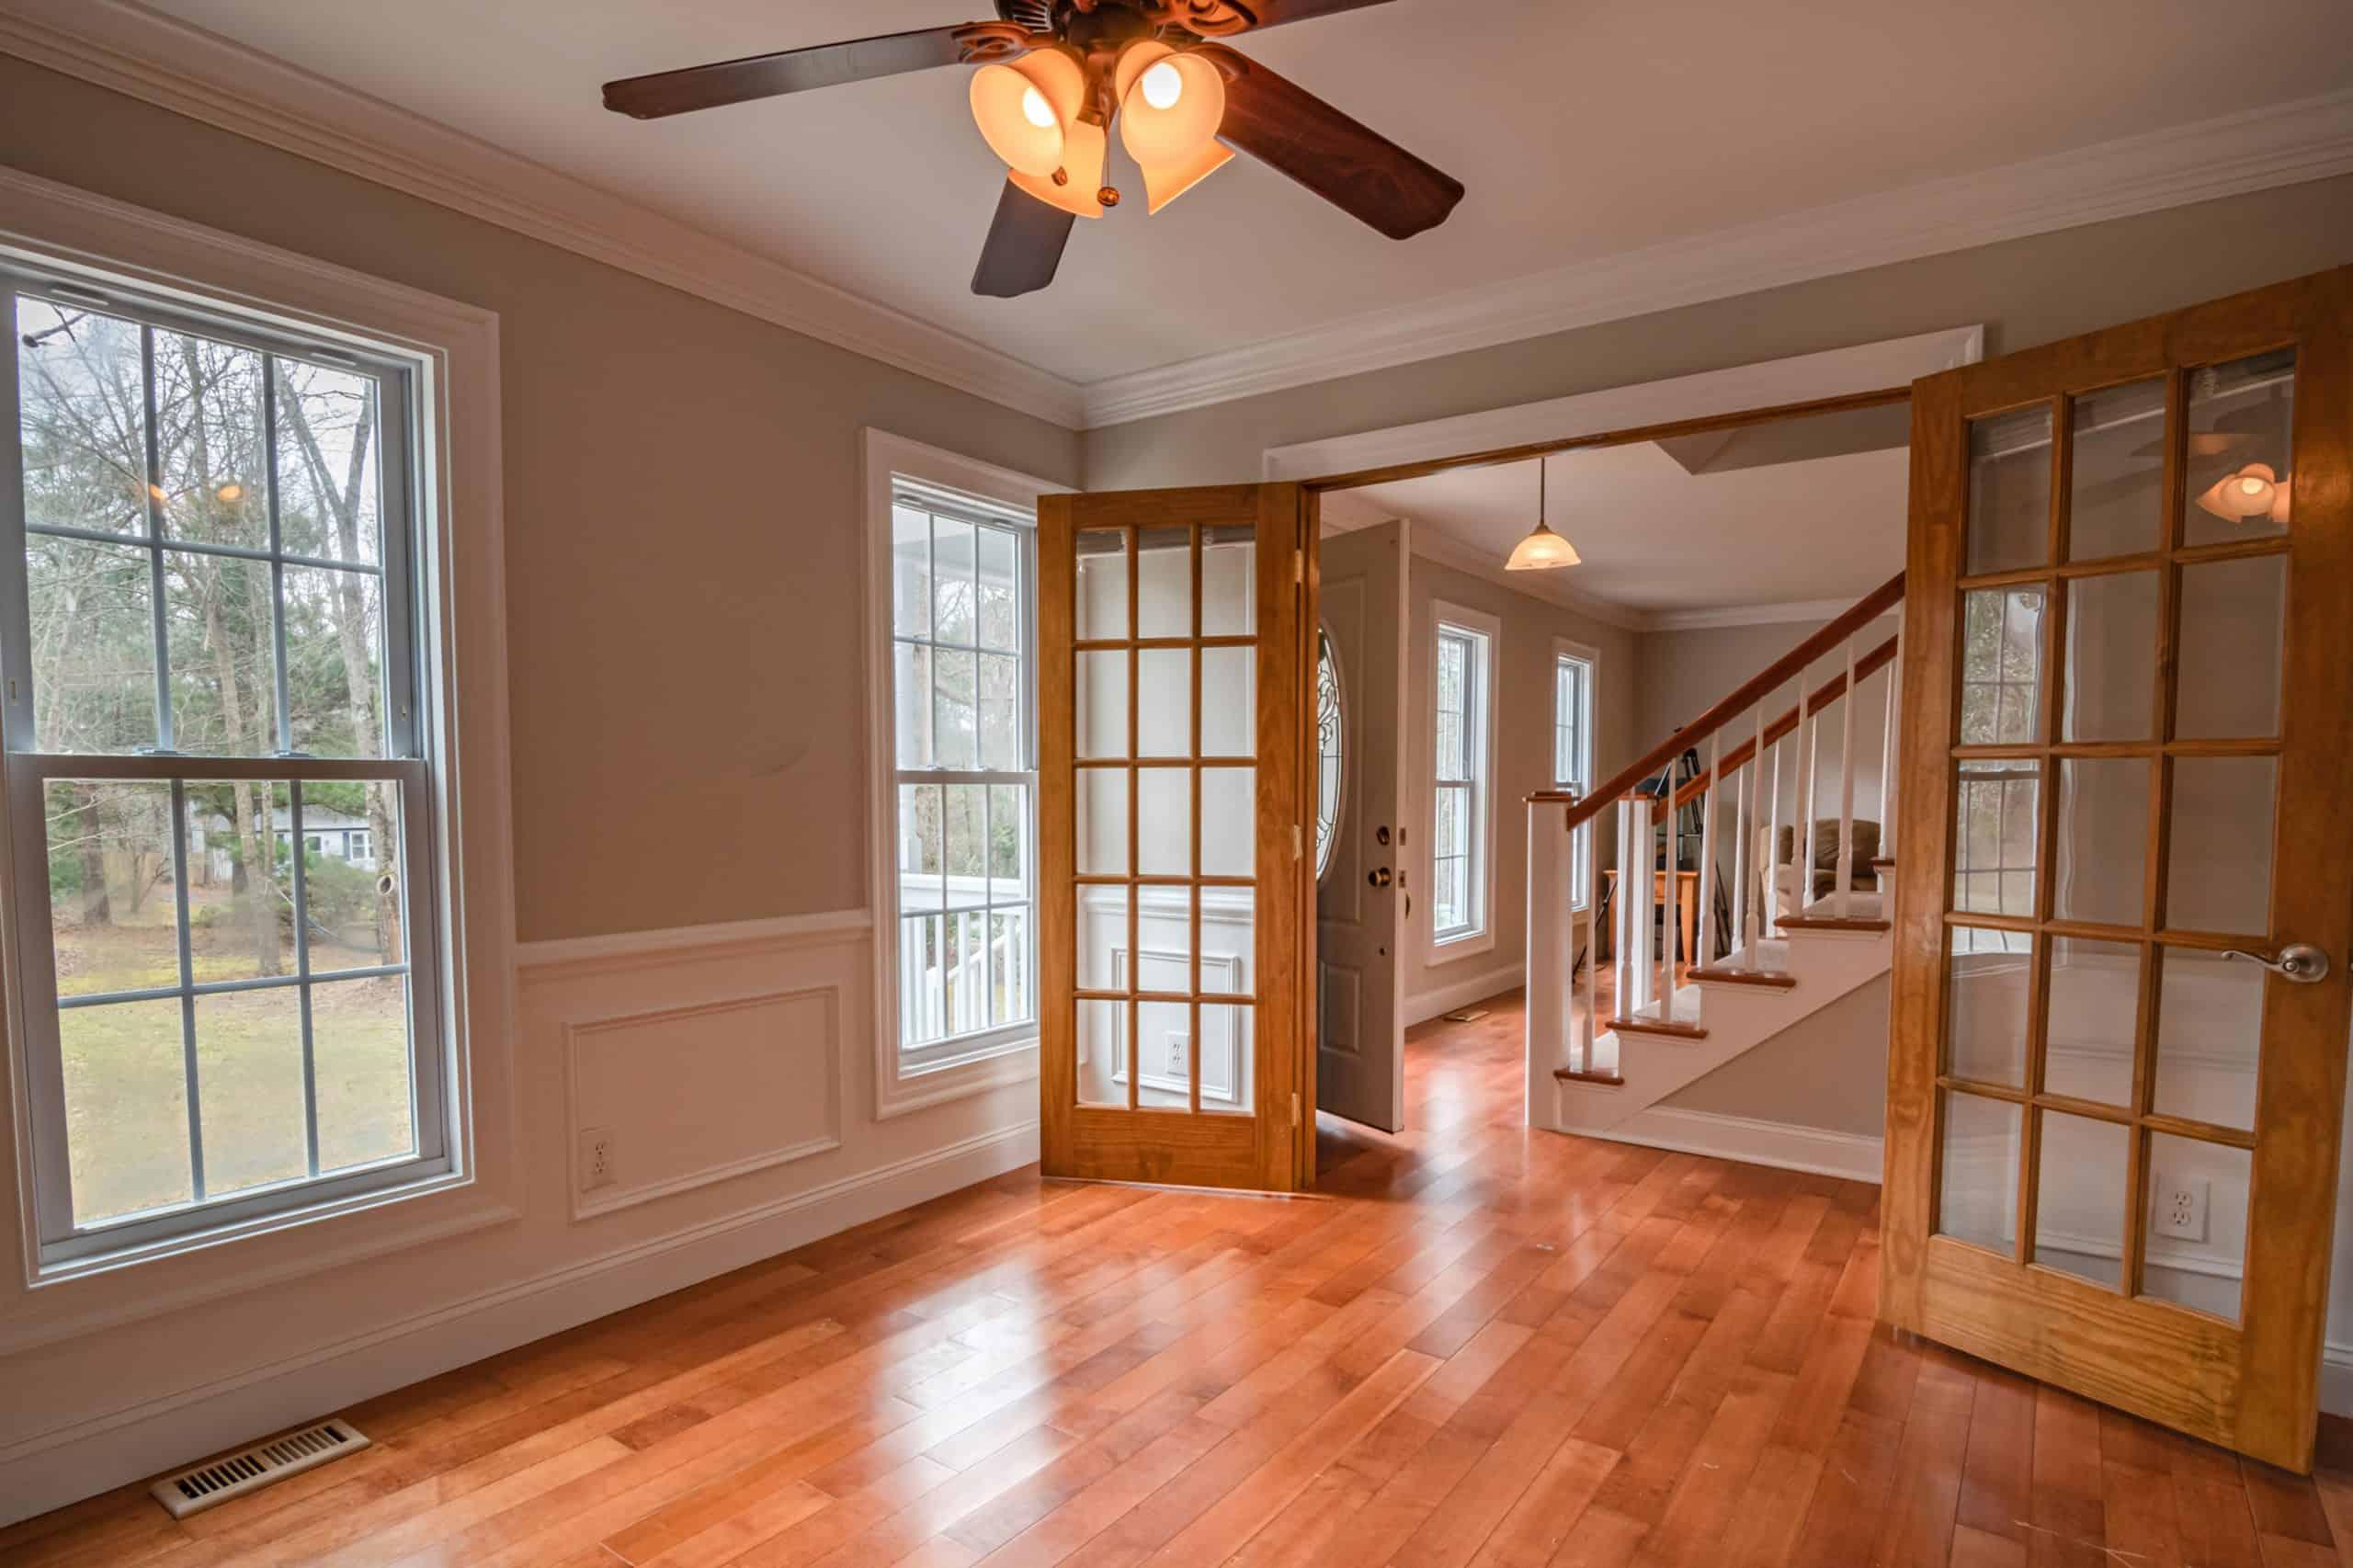 Wooden framed doors